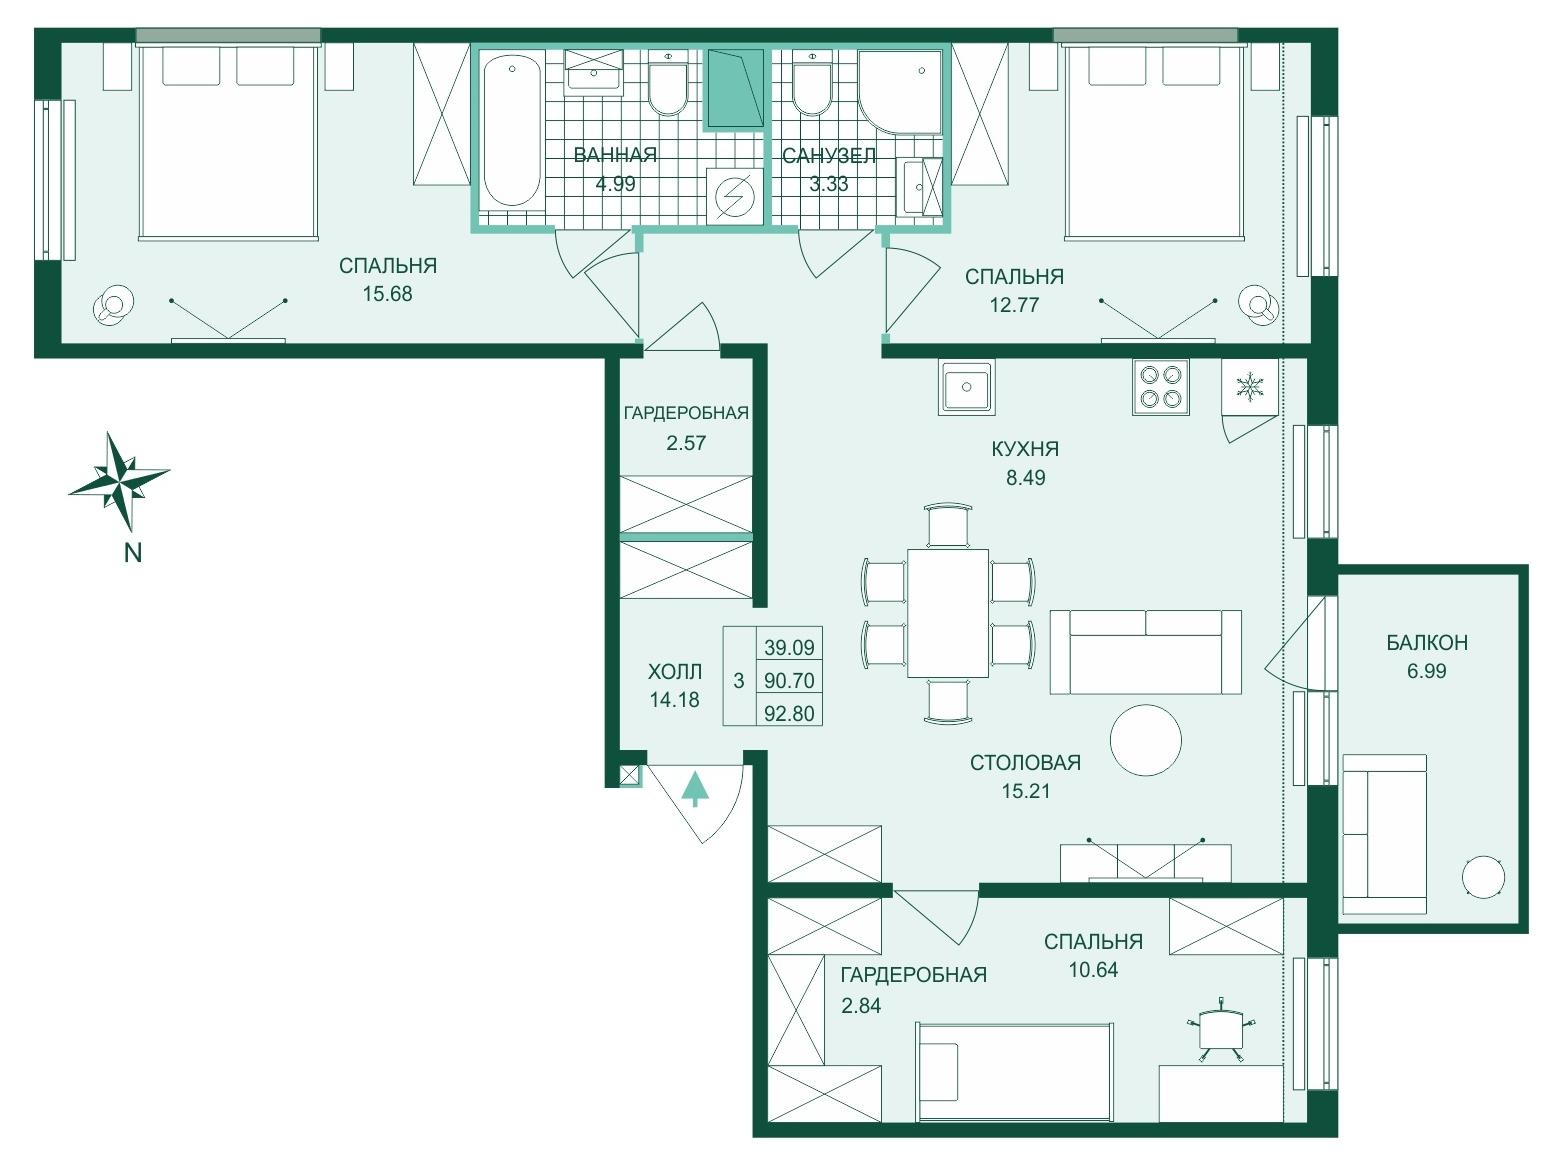 Планировка Четырёхкомнатная квартира (Евро) площадью 92.8 кв.м в ЖК «Skandi Klubb»